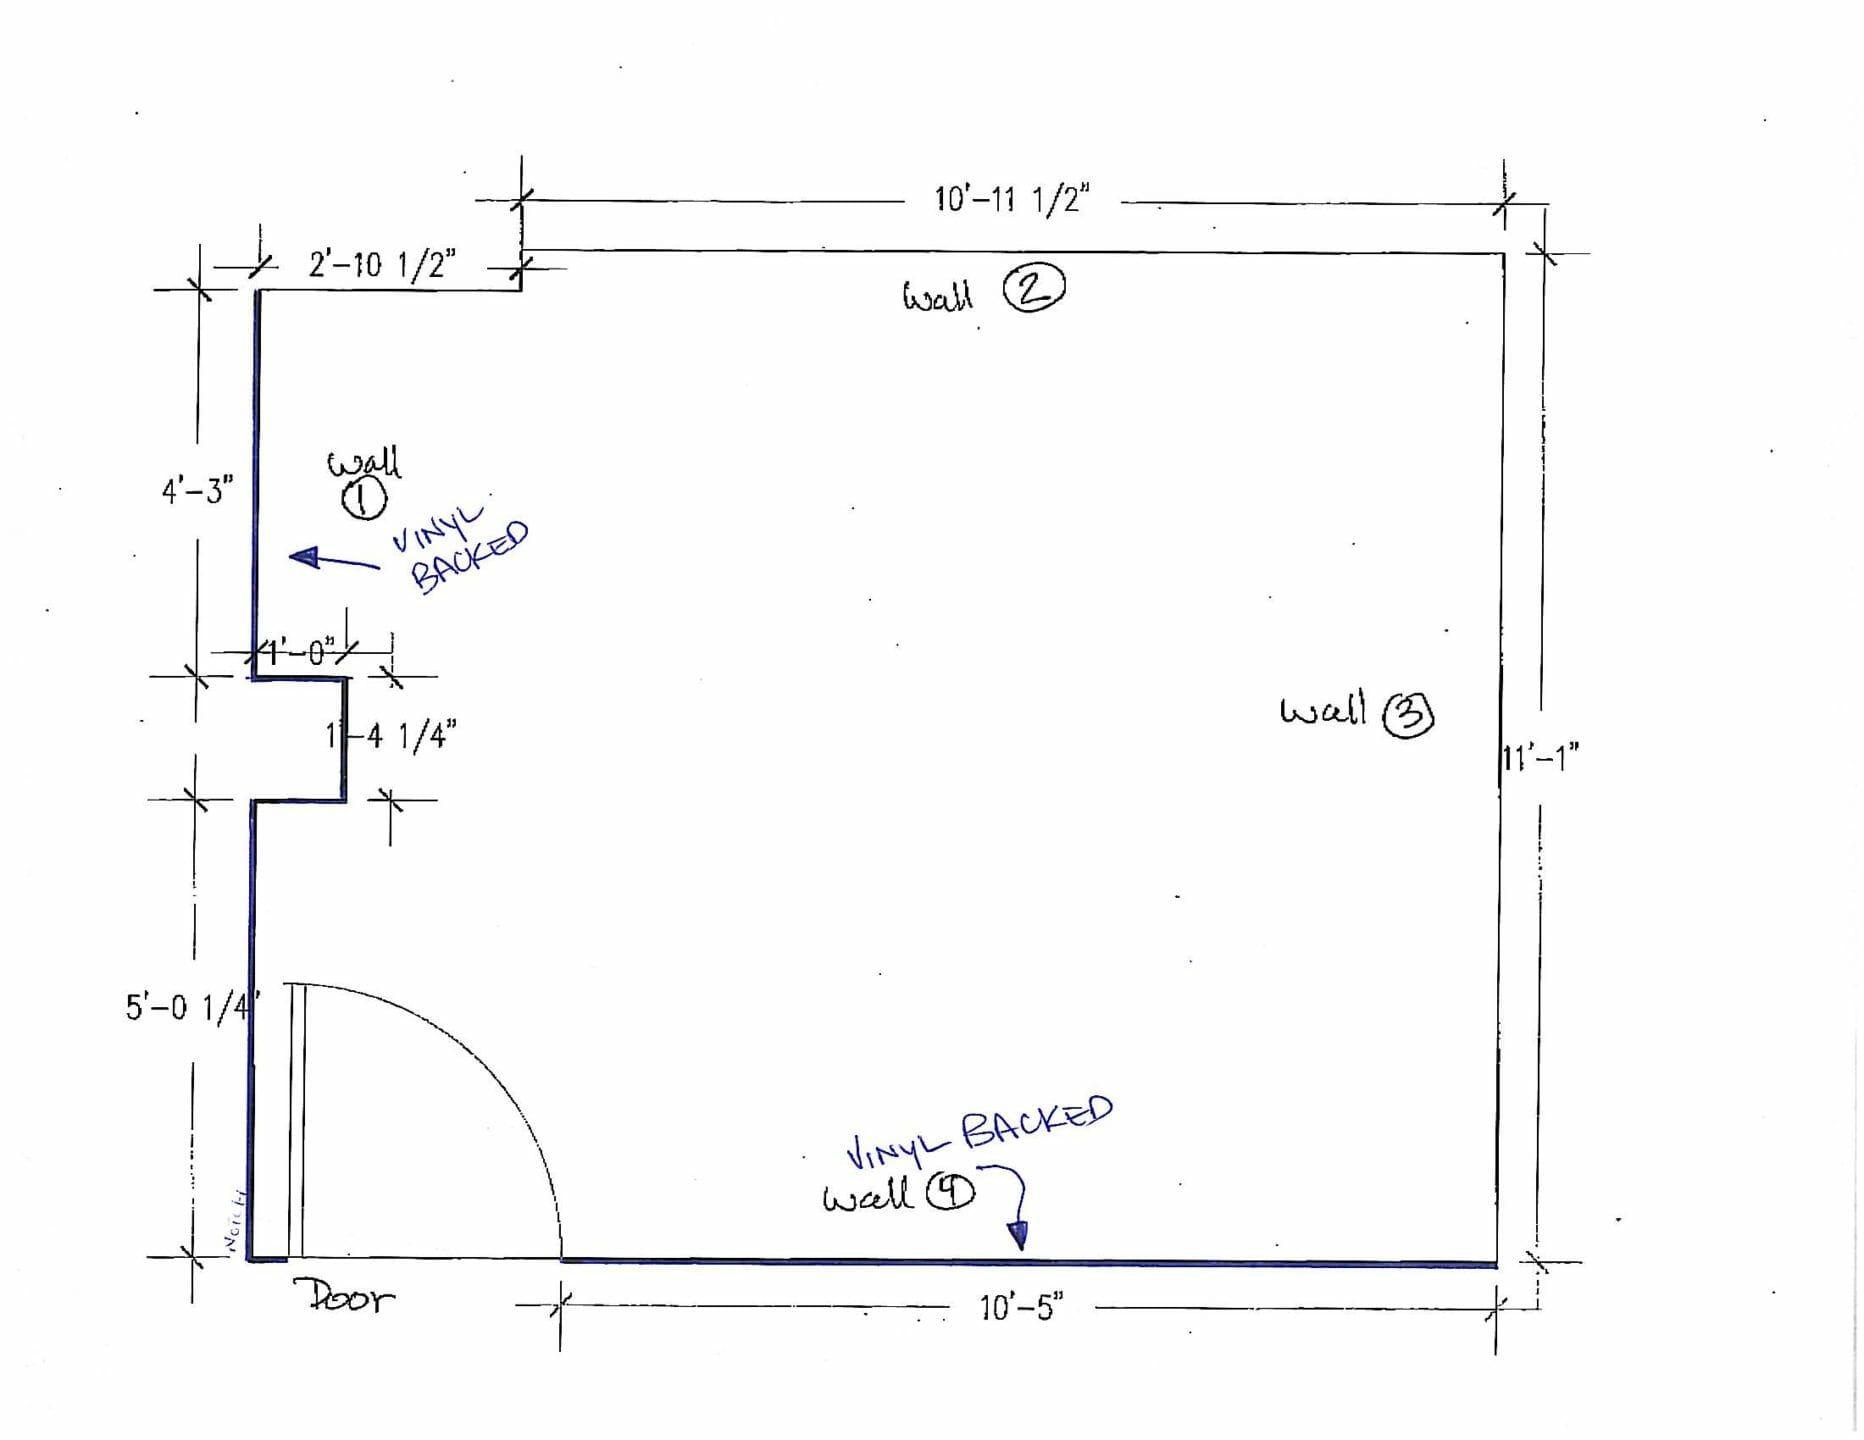 game room plan